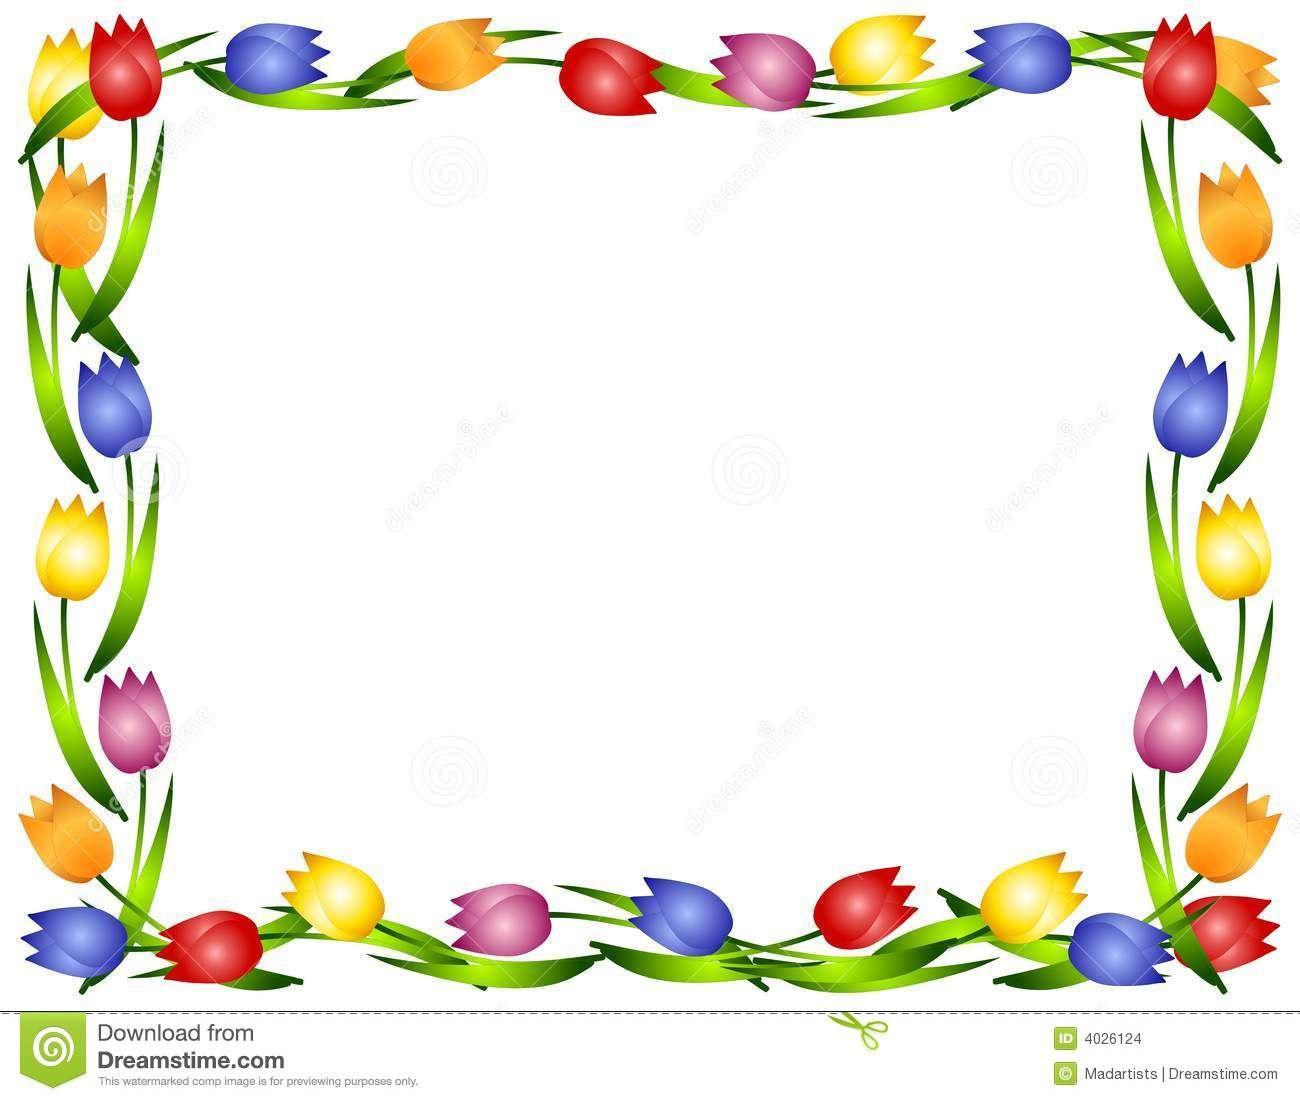 Flower+Border+Clip+Art | ... illustration featuring a frame or ...